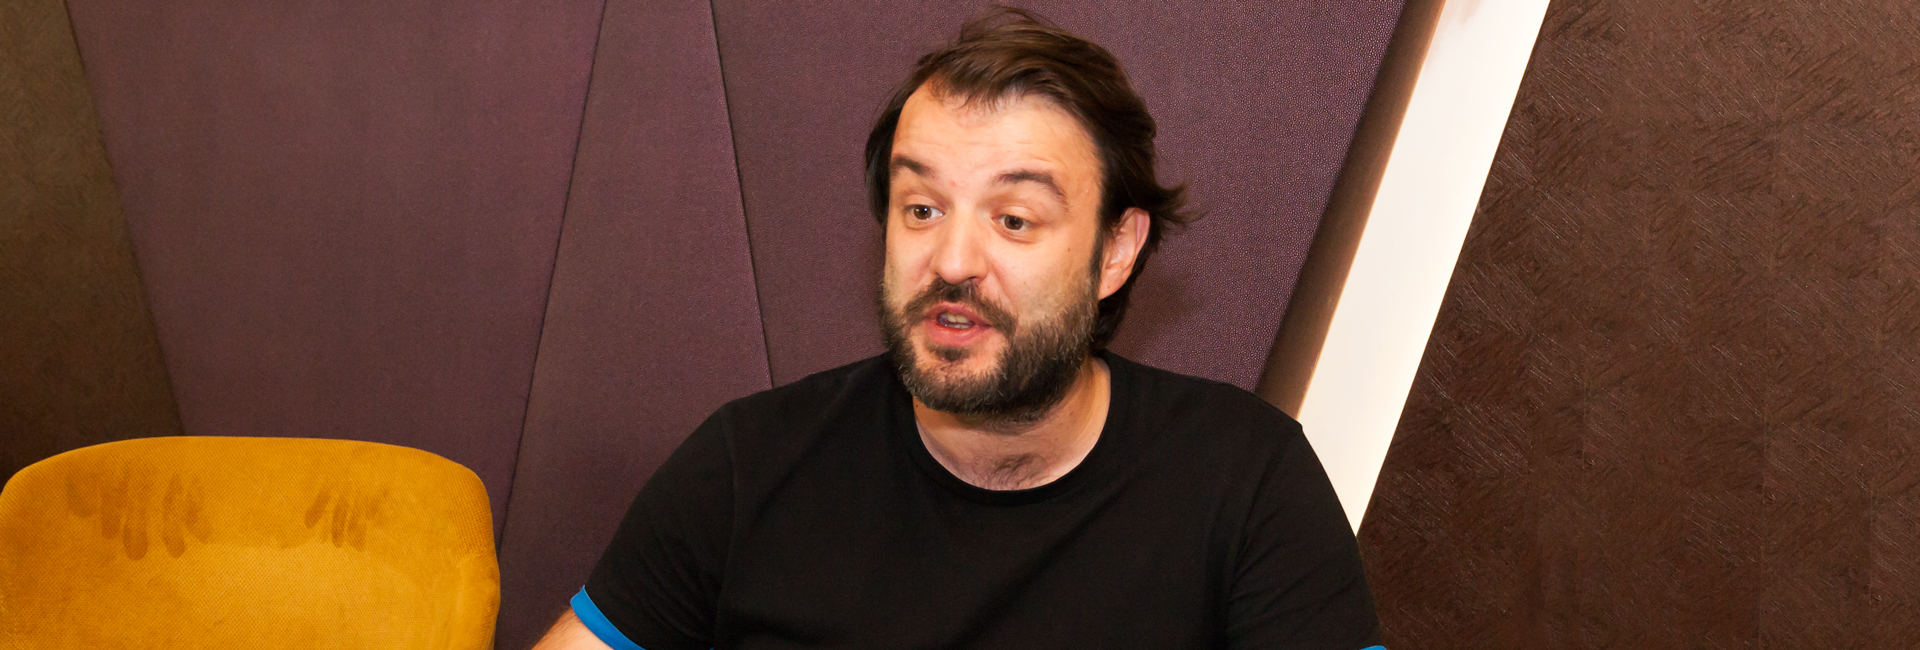 Interviu Vlad Dragulescu Matricea Romaneasca slider 2